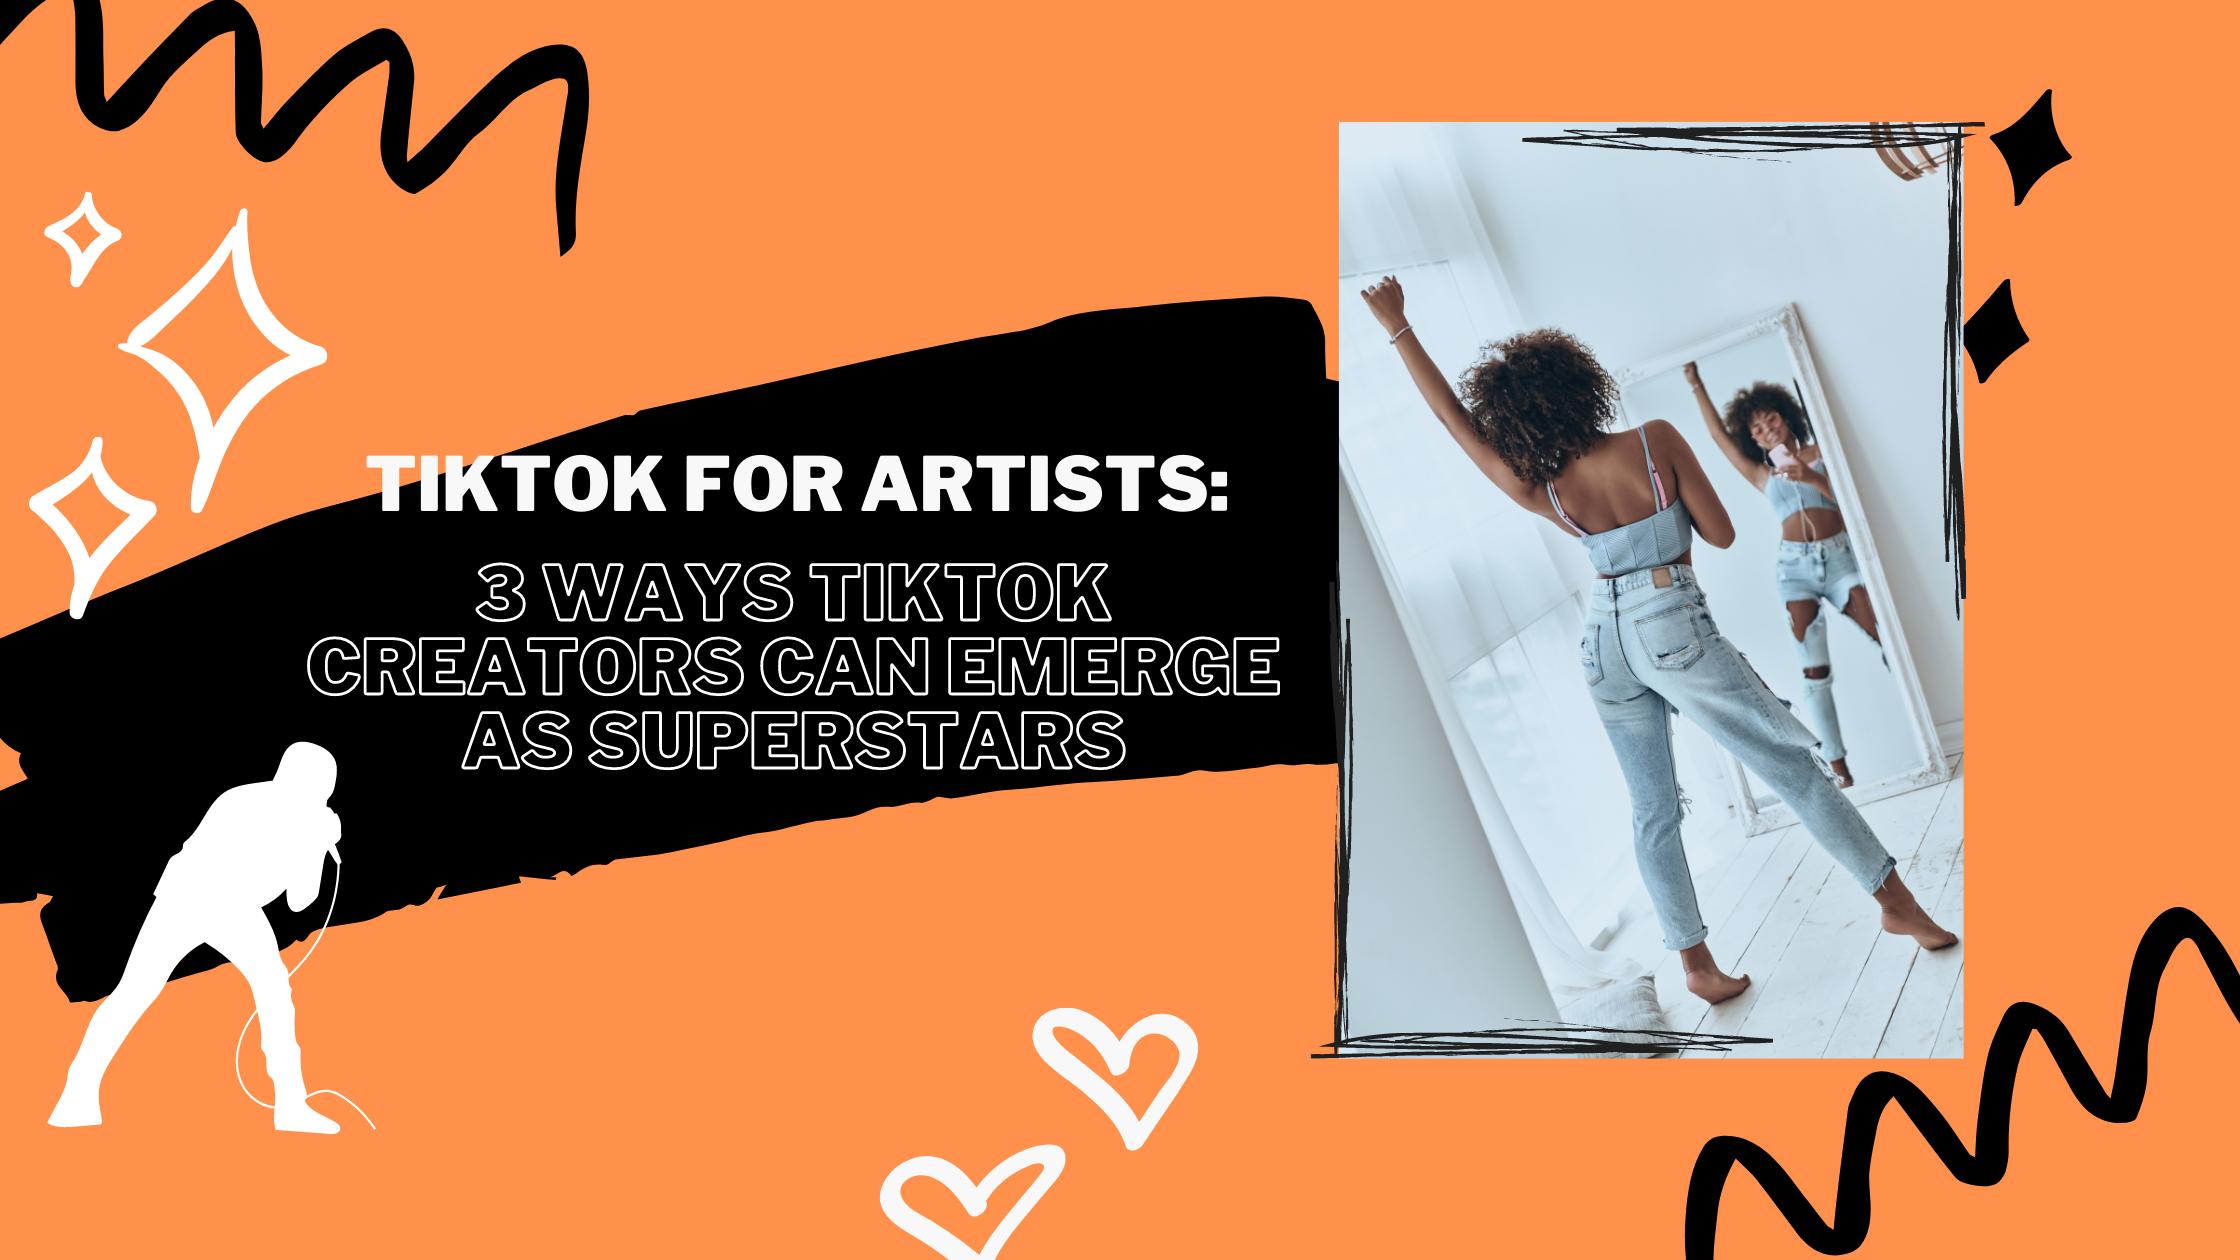 TikTok For Artists: 3 Ways TikTok Creators Can Emerge As Superstars